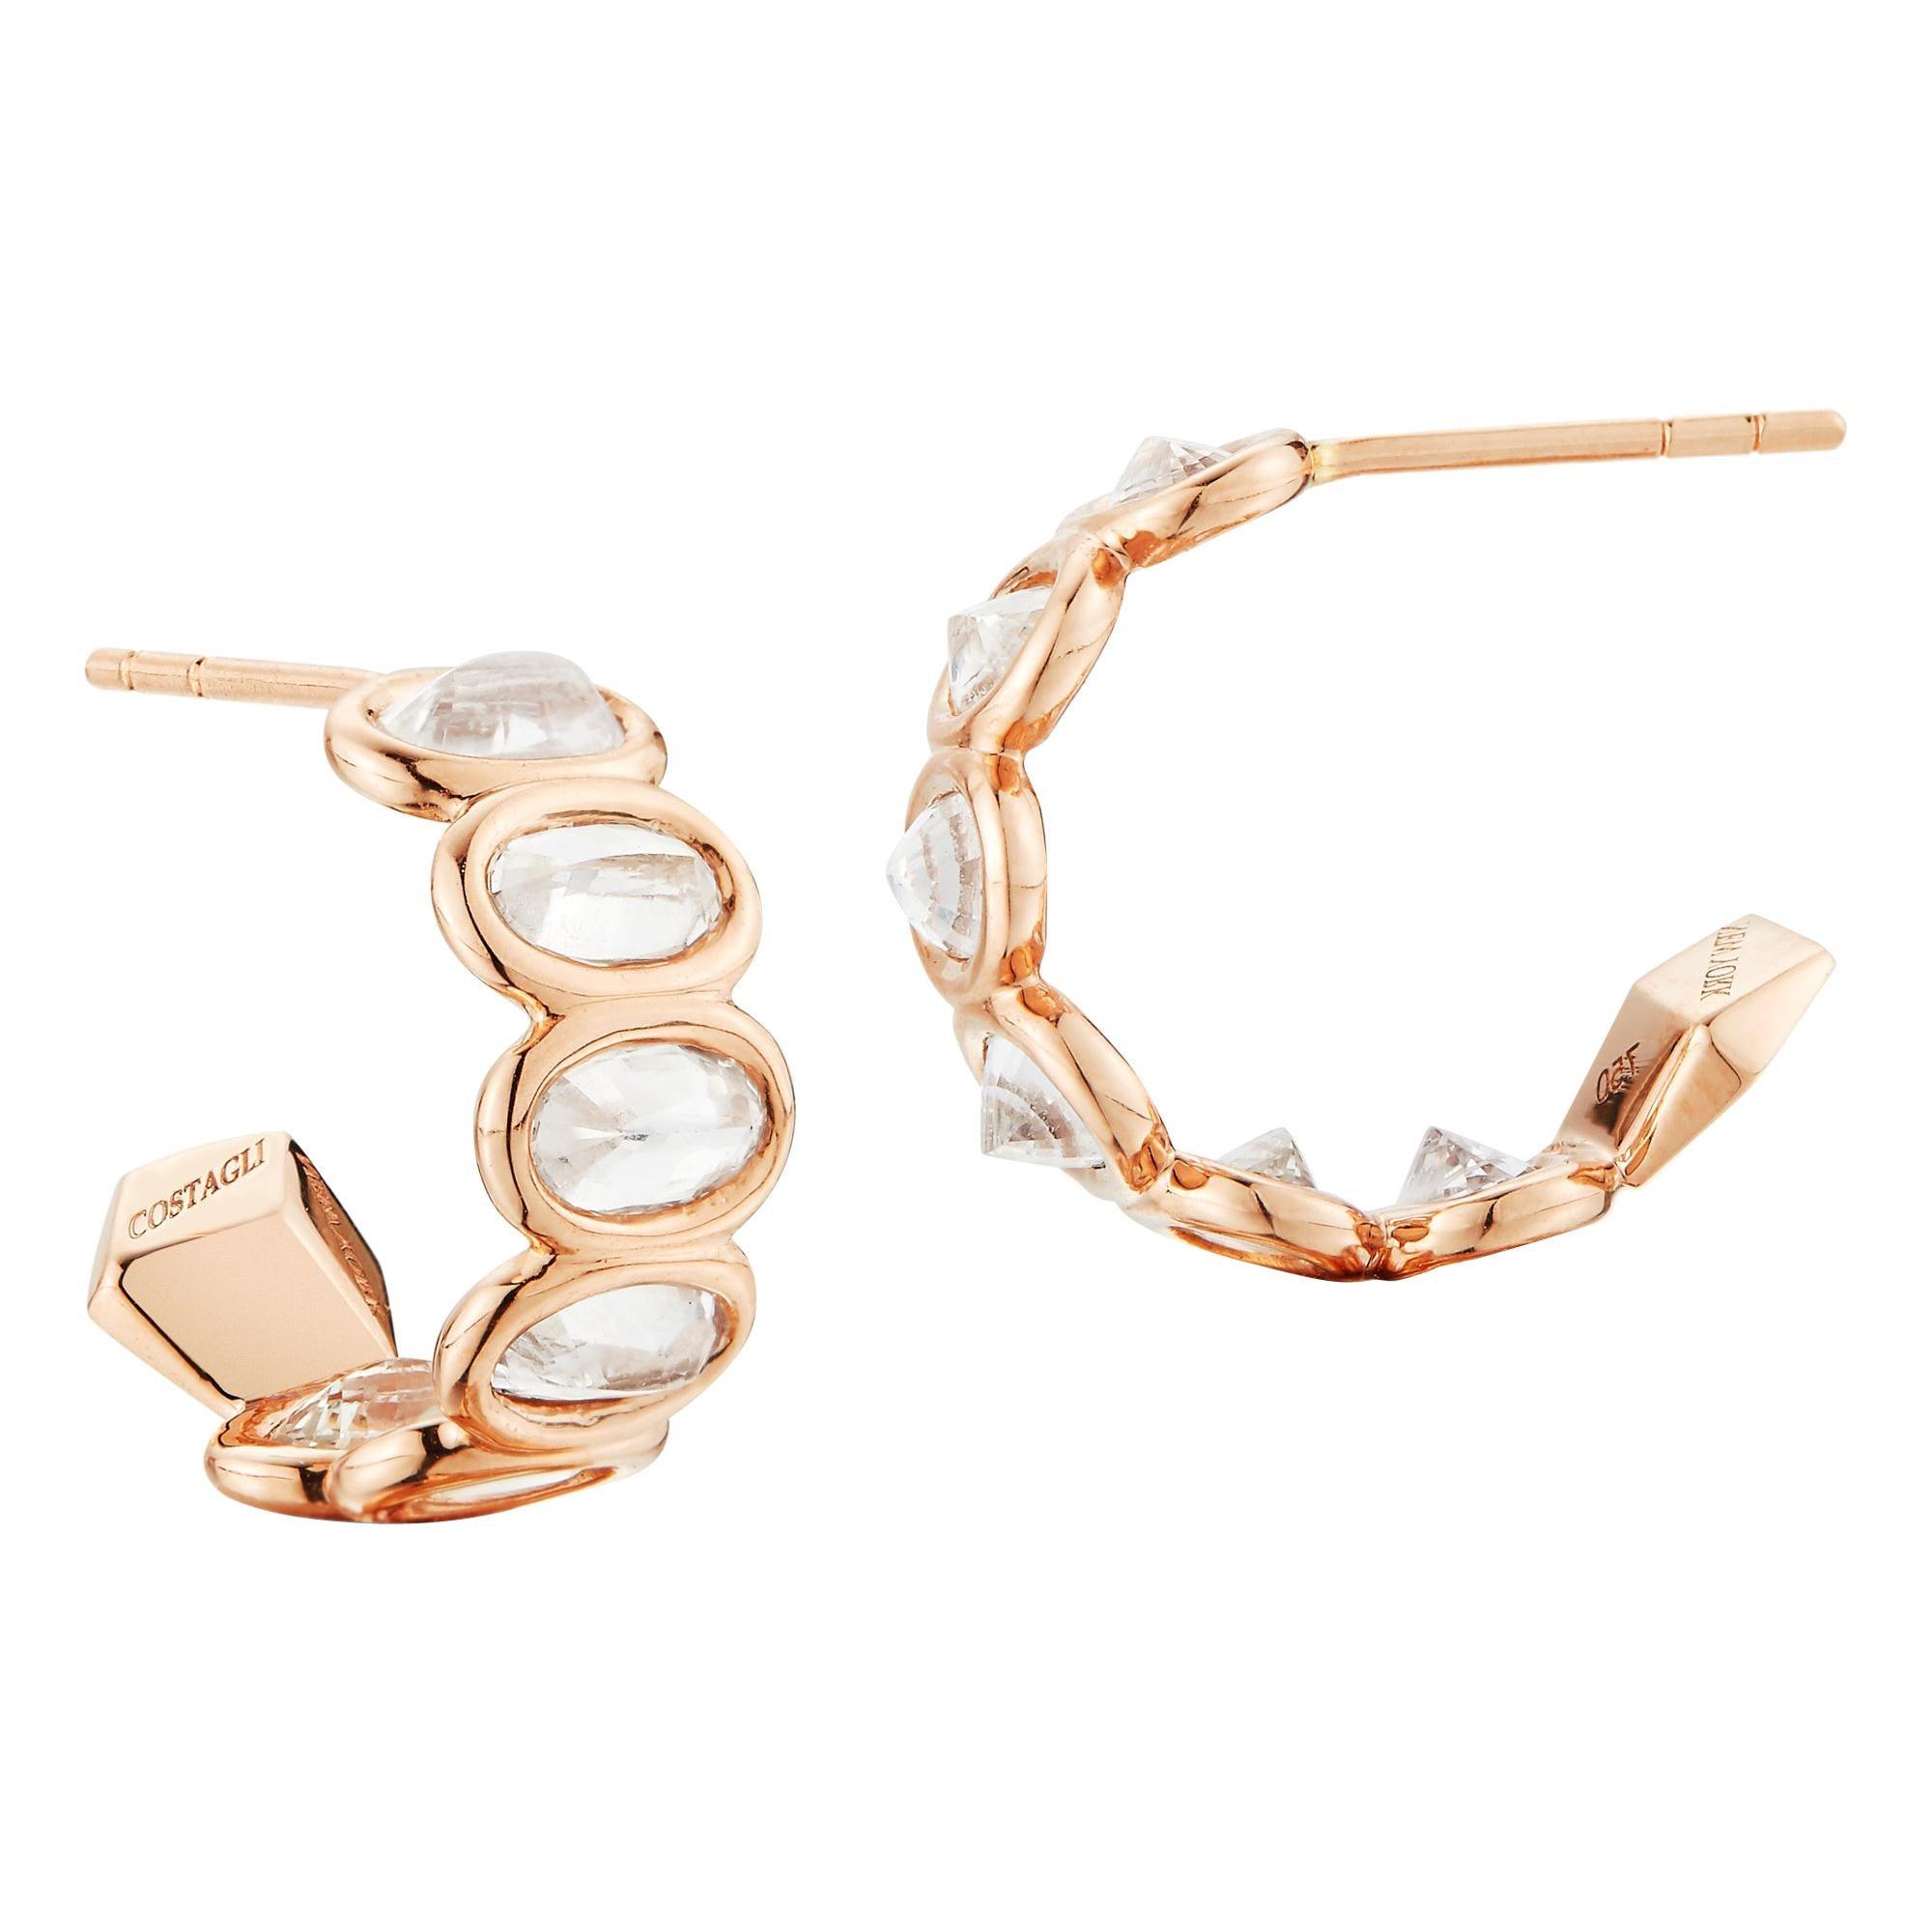 Paolo Costagli 18 Karat Rose Gold White Sapphire 3.30 Carat Hoop Earring, Petite